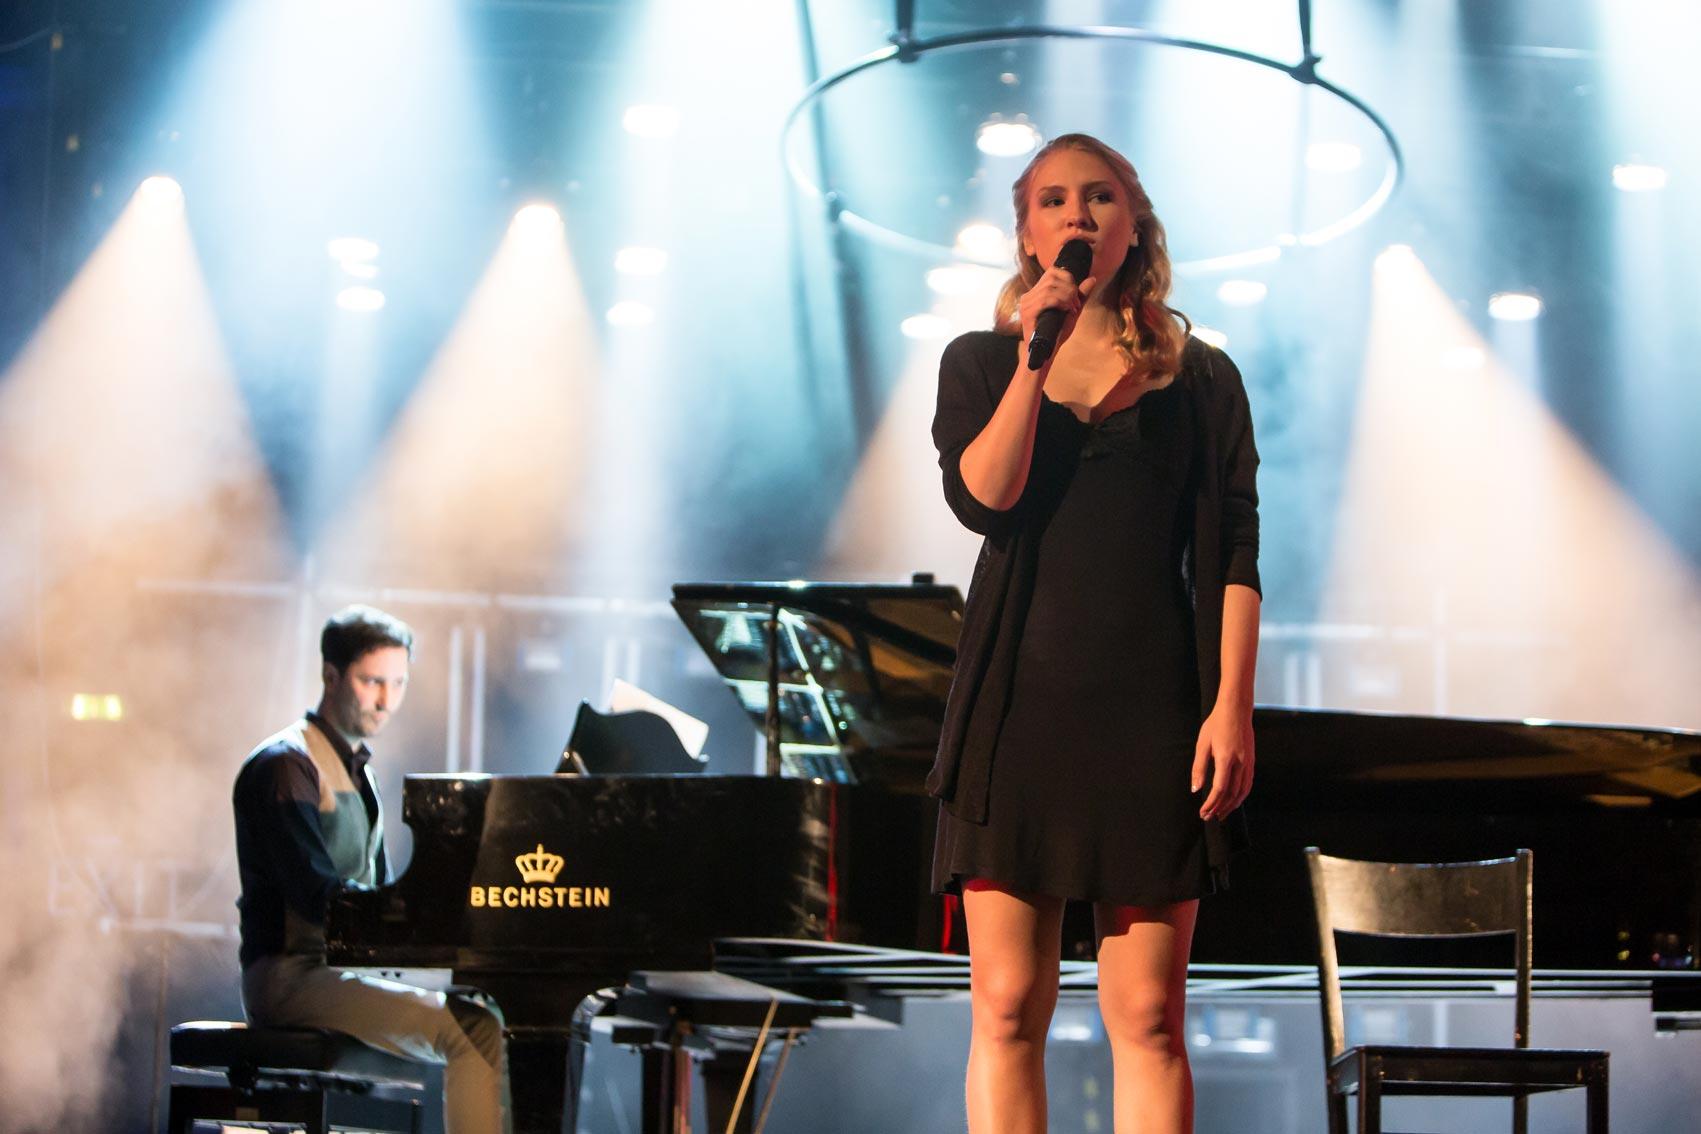 Nicola Kripylo sings on stage